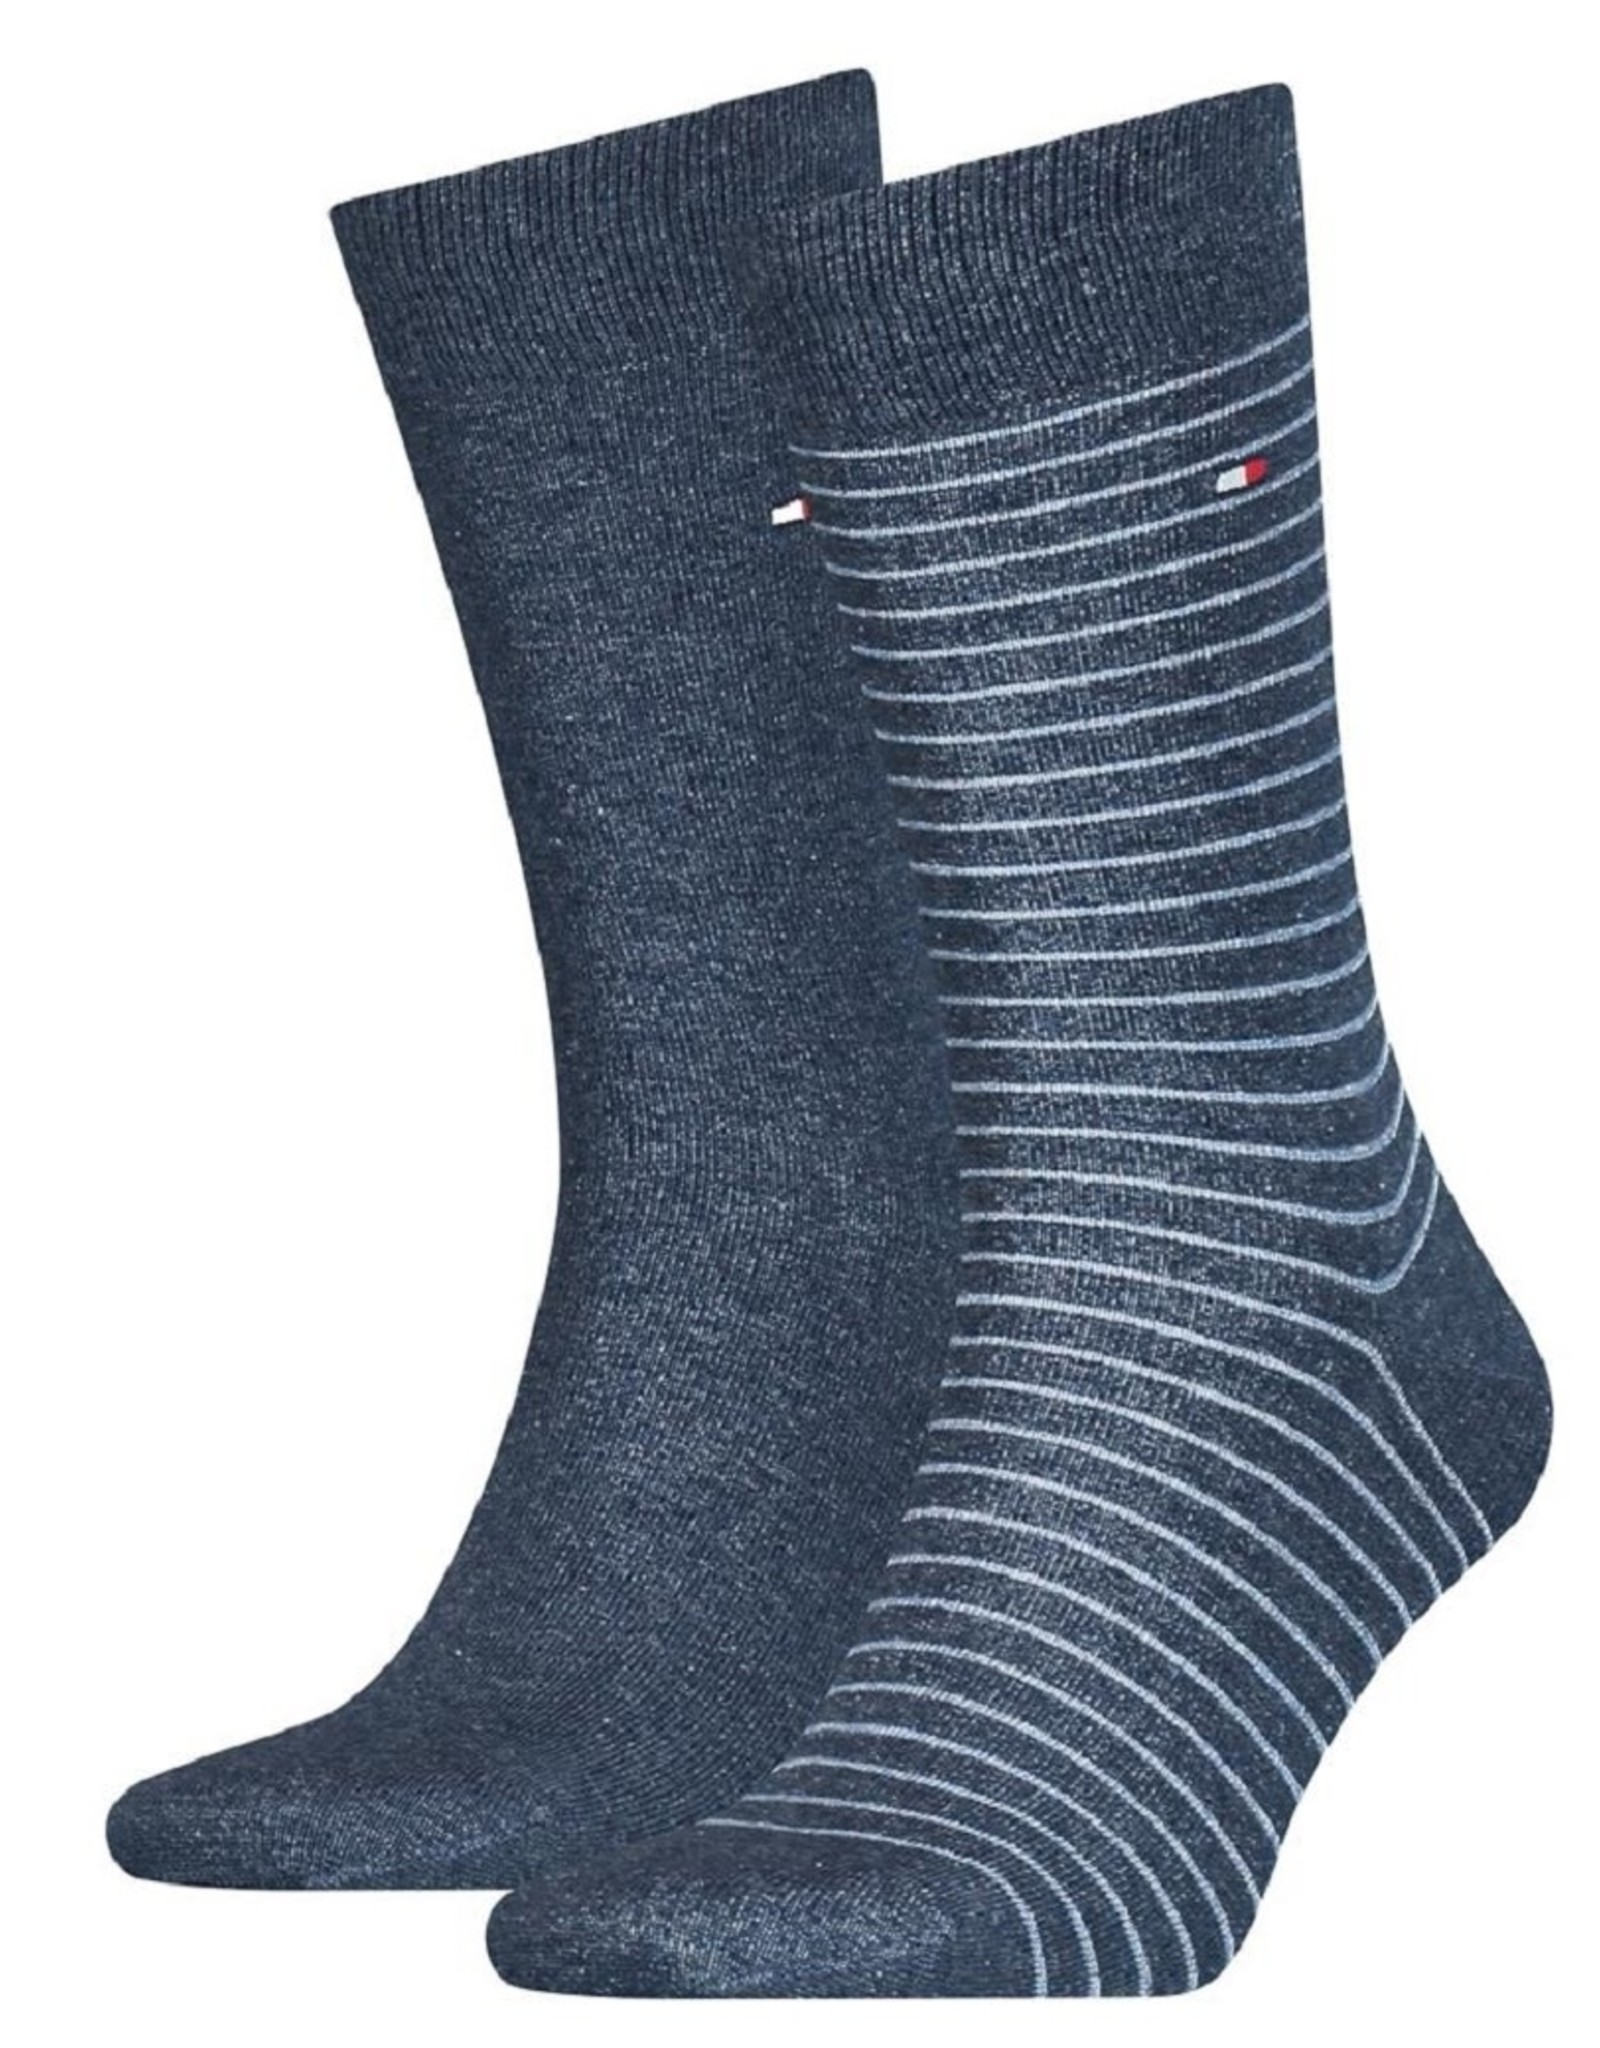 Tommy Hilfiger Tommy Hilfiger Small Stripe Sokken 2pack jeans blauw